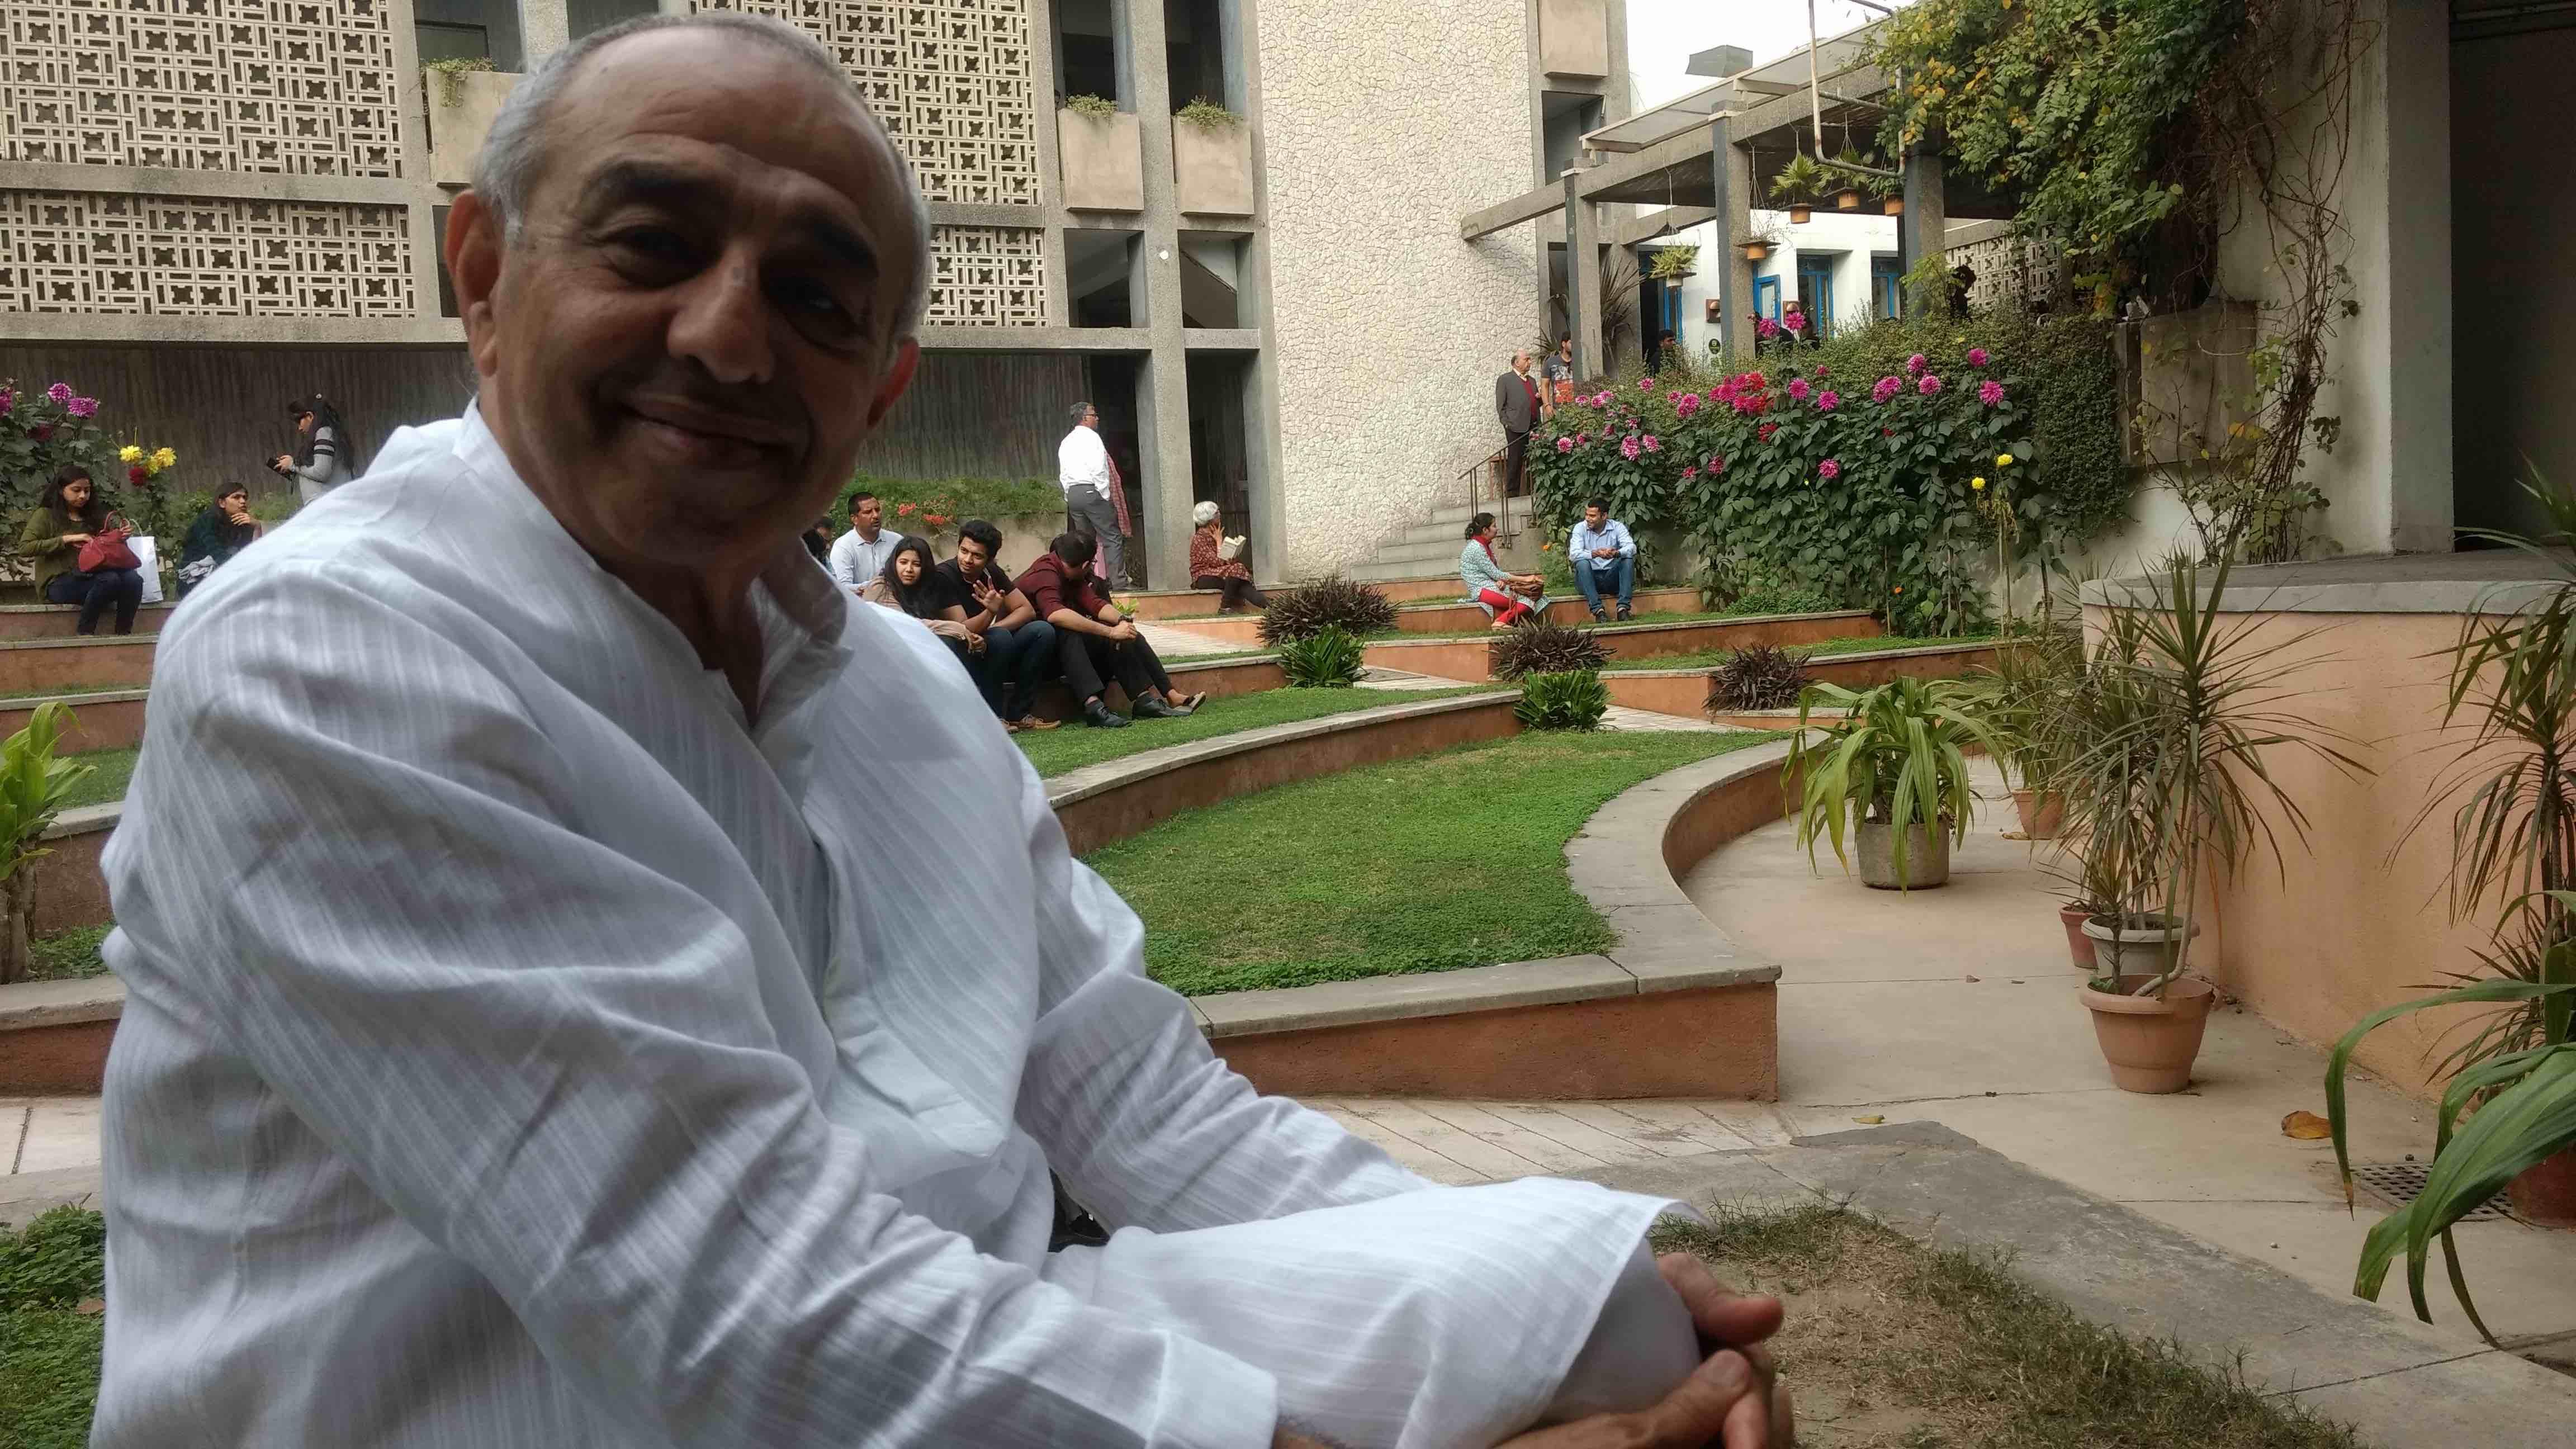 Astad Deboo at Triveni Kala Sangam in New Delhi. Credit: Sangeeta Barooah Pisharoty